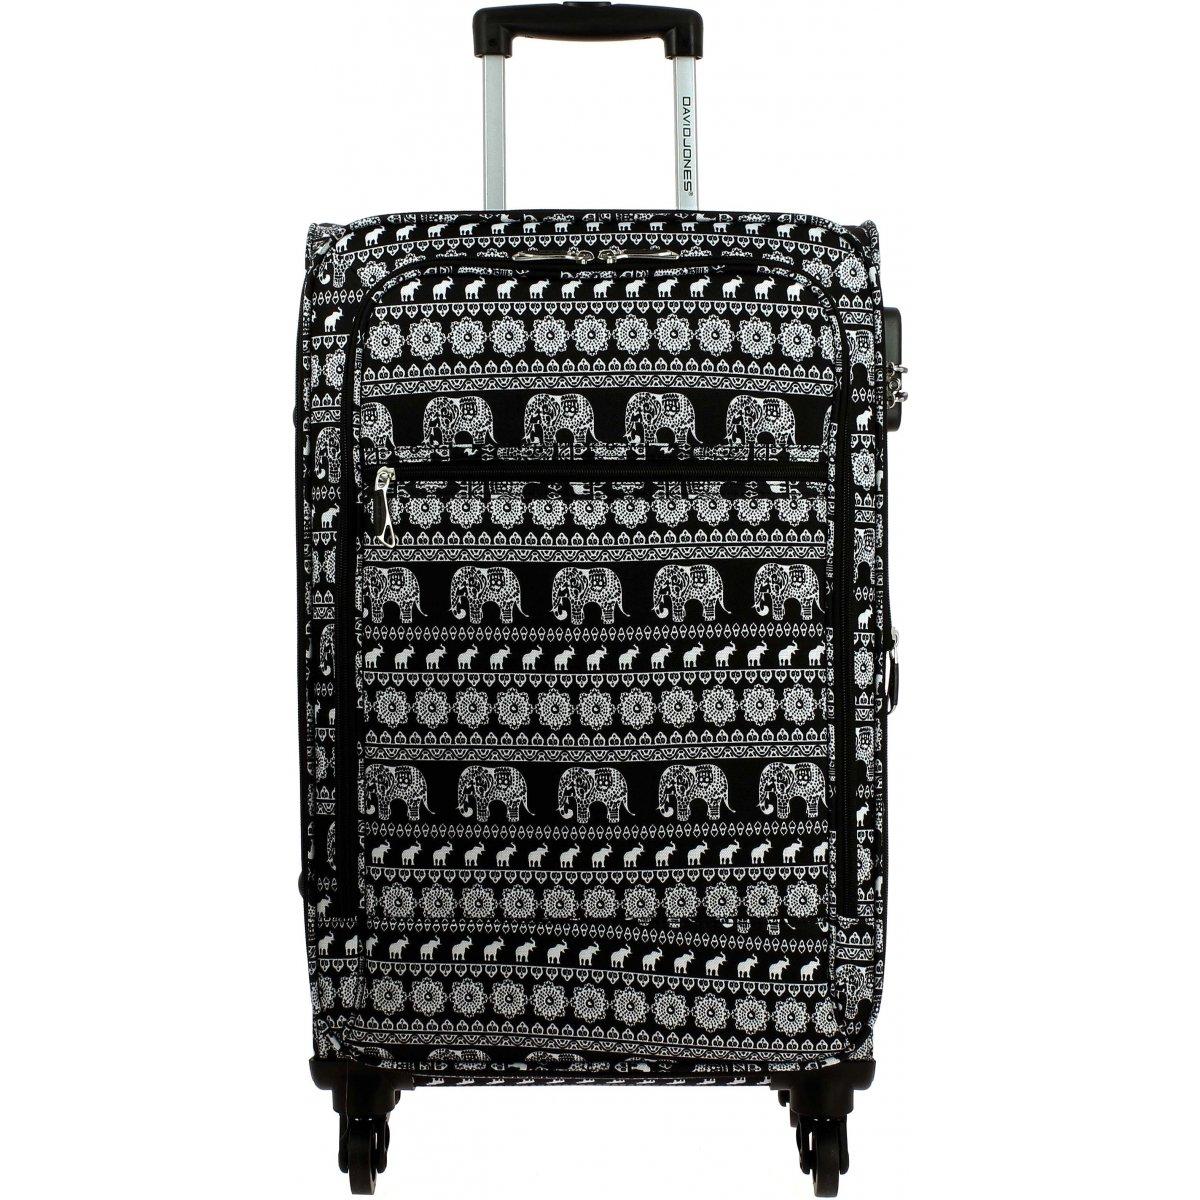 valise sans marque pas cher. Black Bedroom Furniture Sets. Home Design Ideas